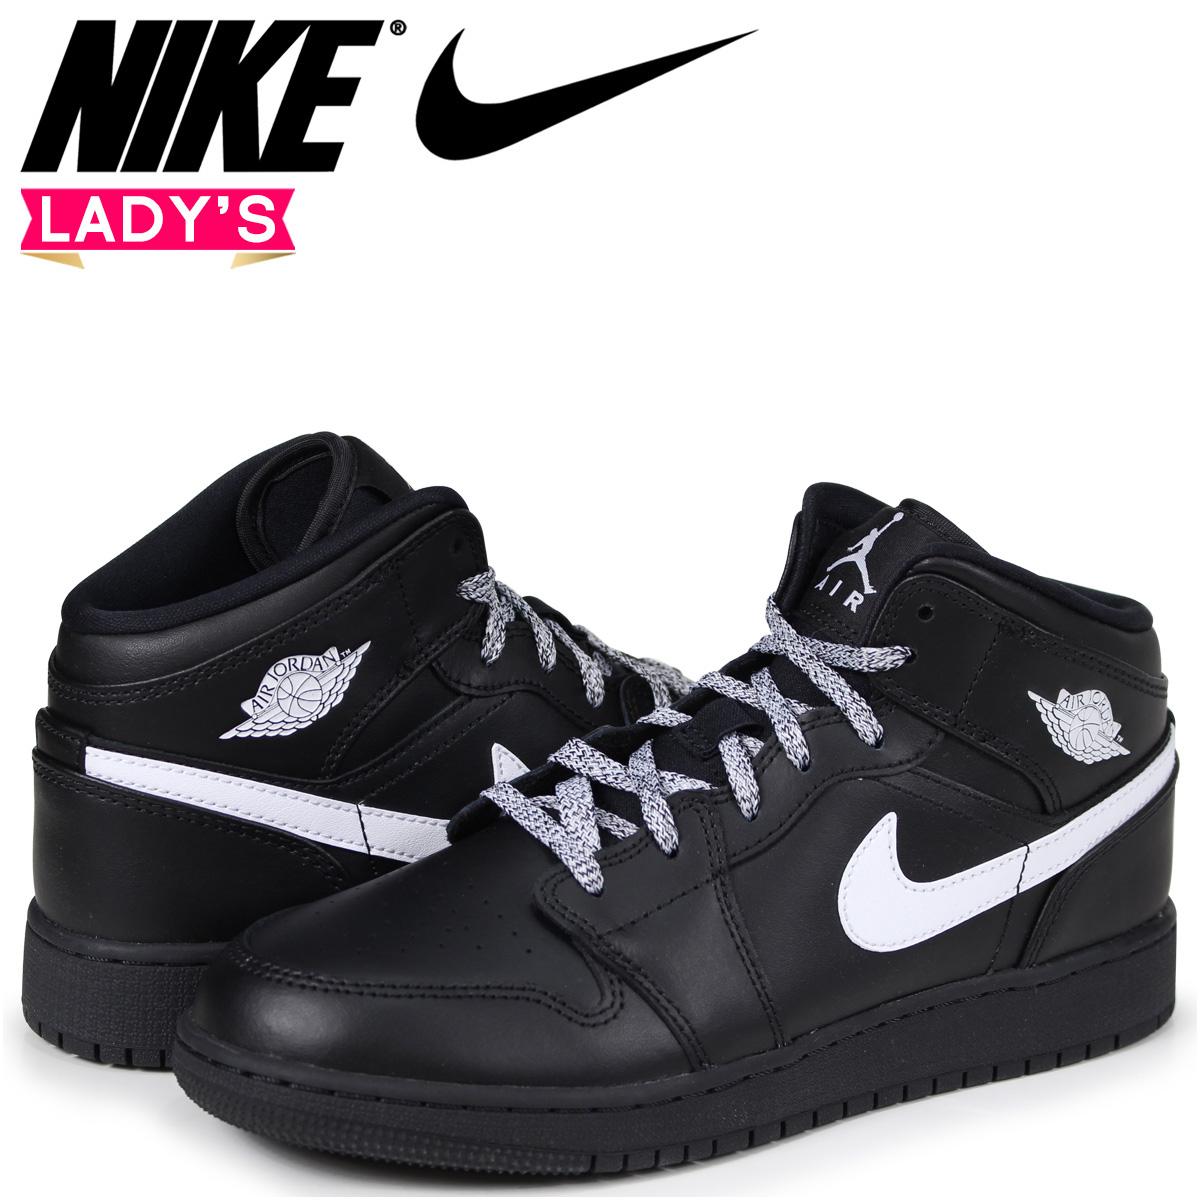 667d6d73222 NIKE AIR JORDAN 1 MID BG Nike Air Jordan 1 Lady's sneakers black  554,725-049 ...